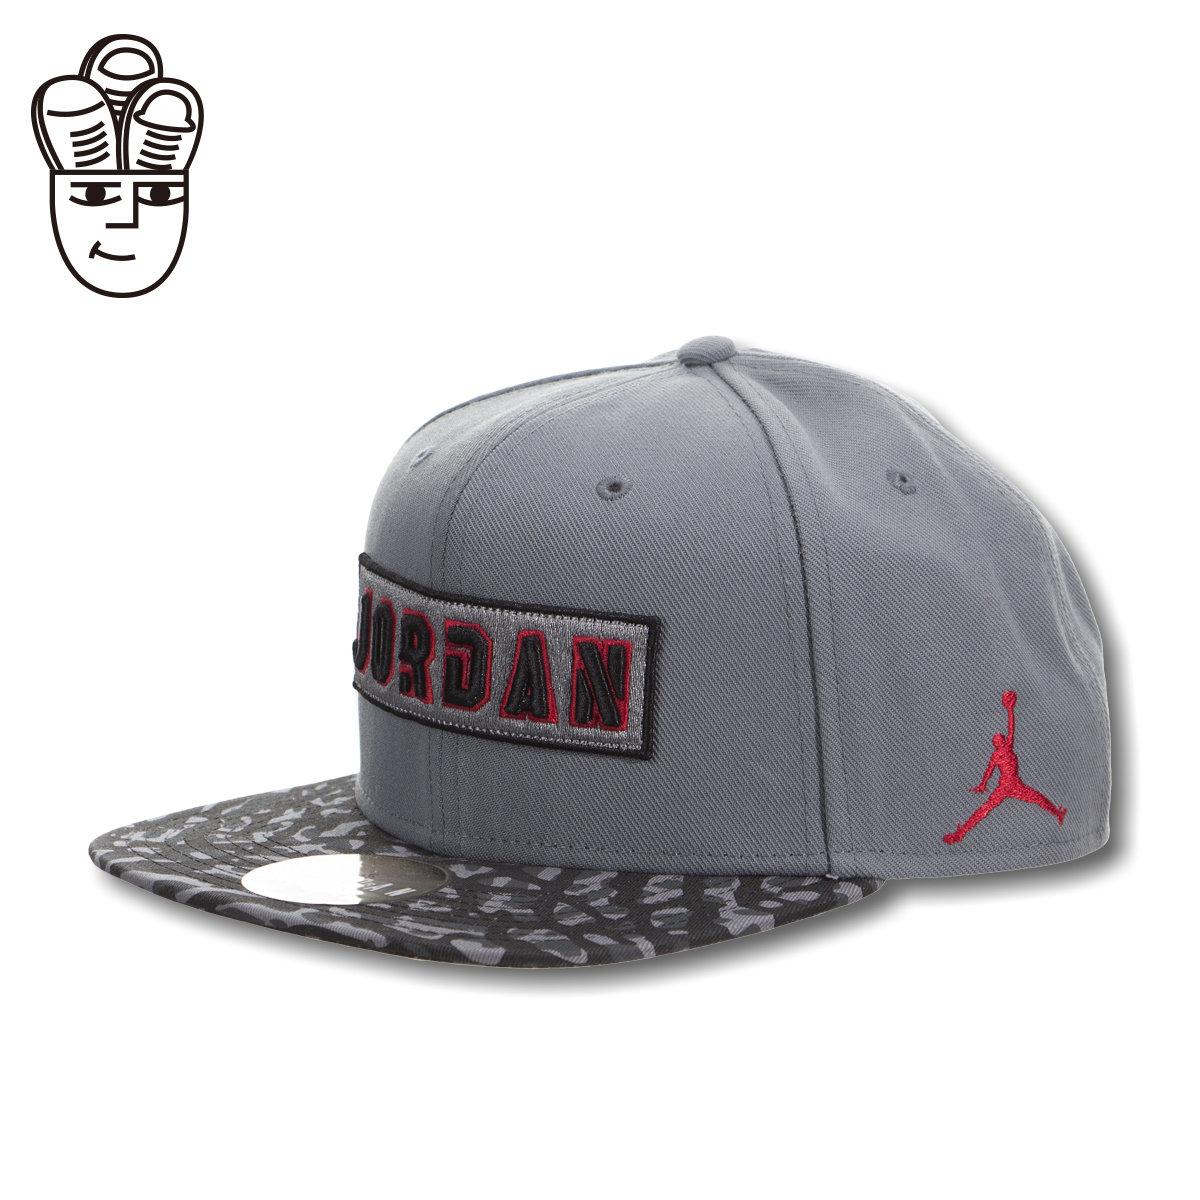 Jordan jumpman aj fashion camo snapback baseball cap flat brimmed hat  leisure hat b7d39c1a1456